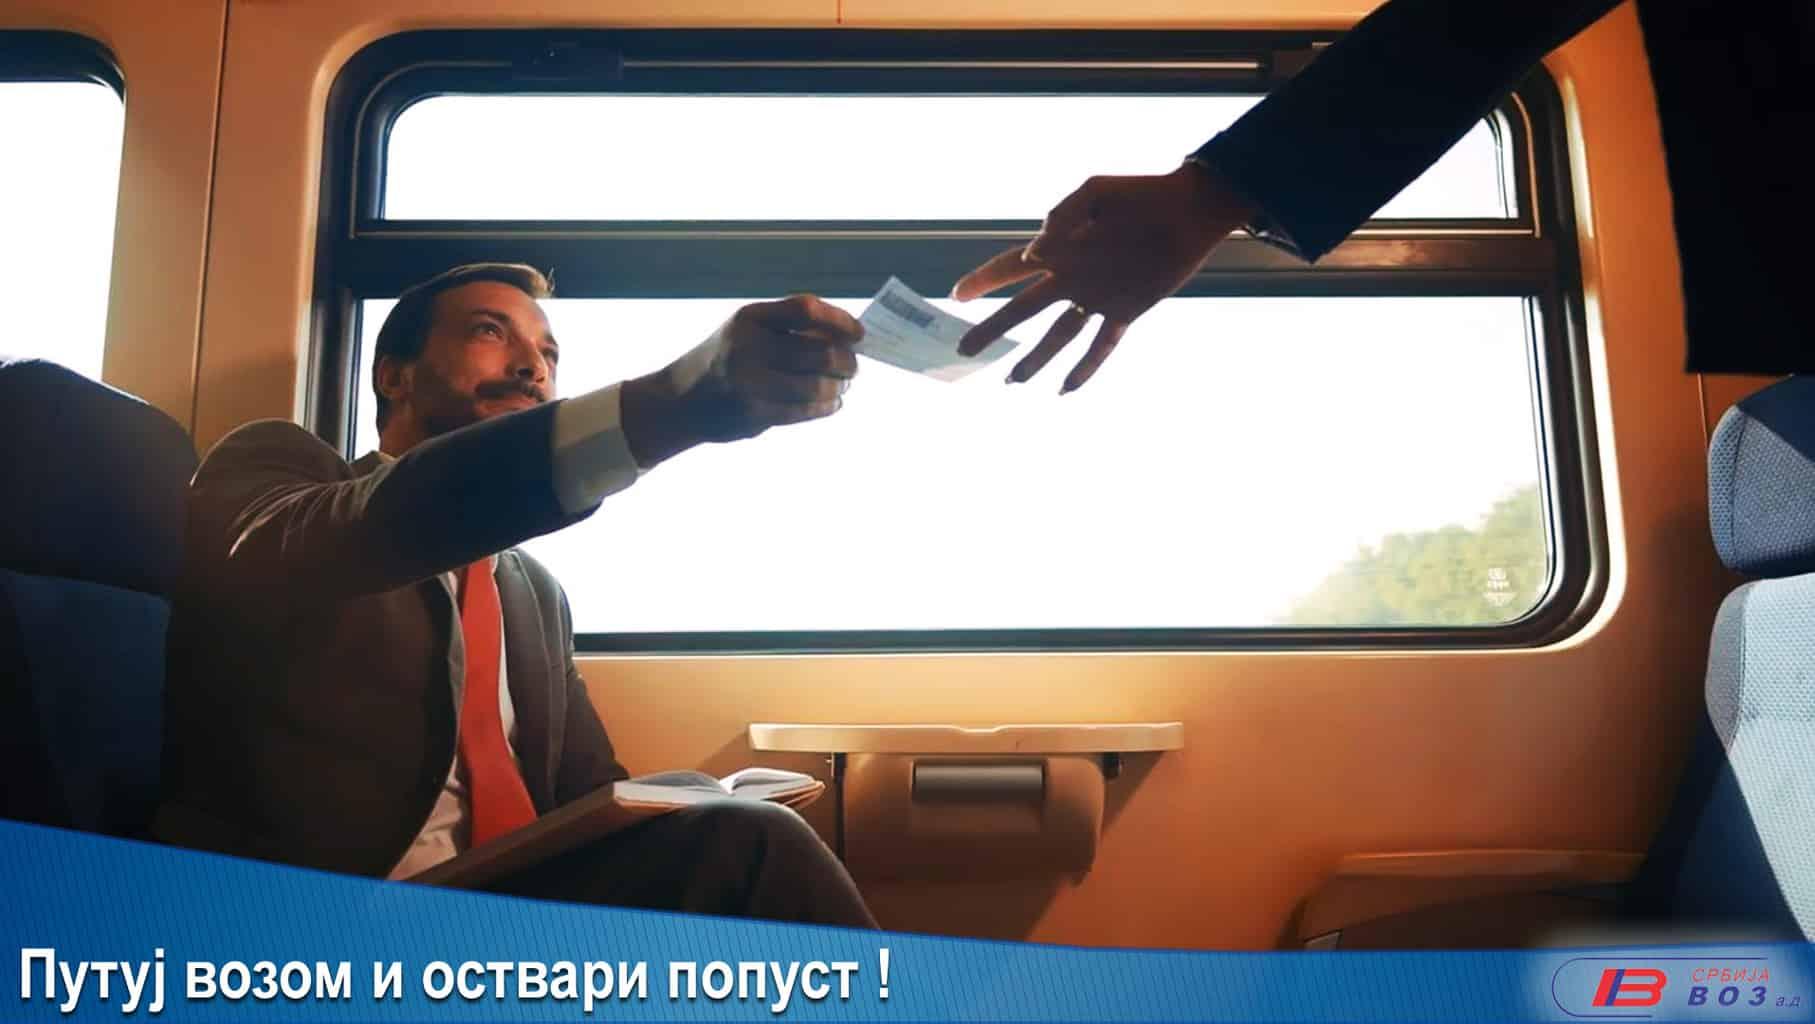 Atlas bolnica i Srbija voz popust